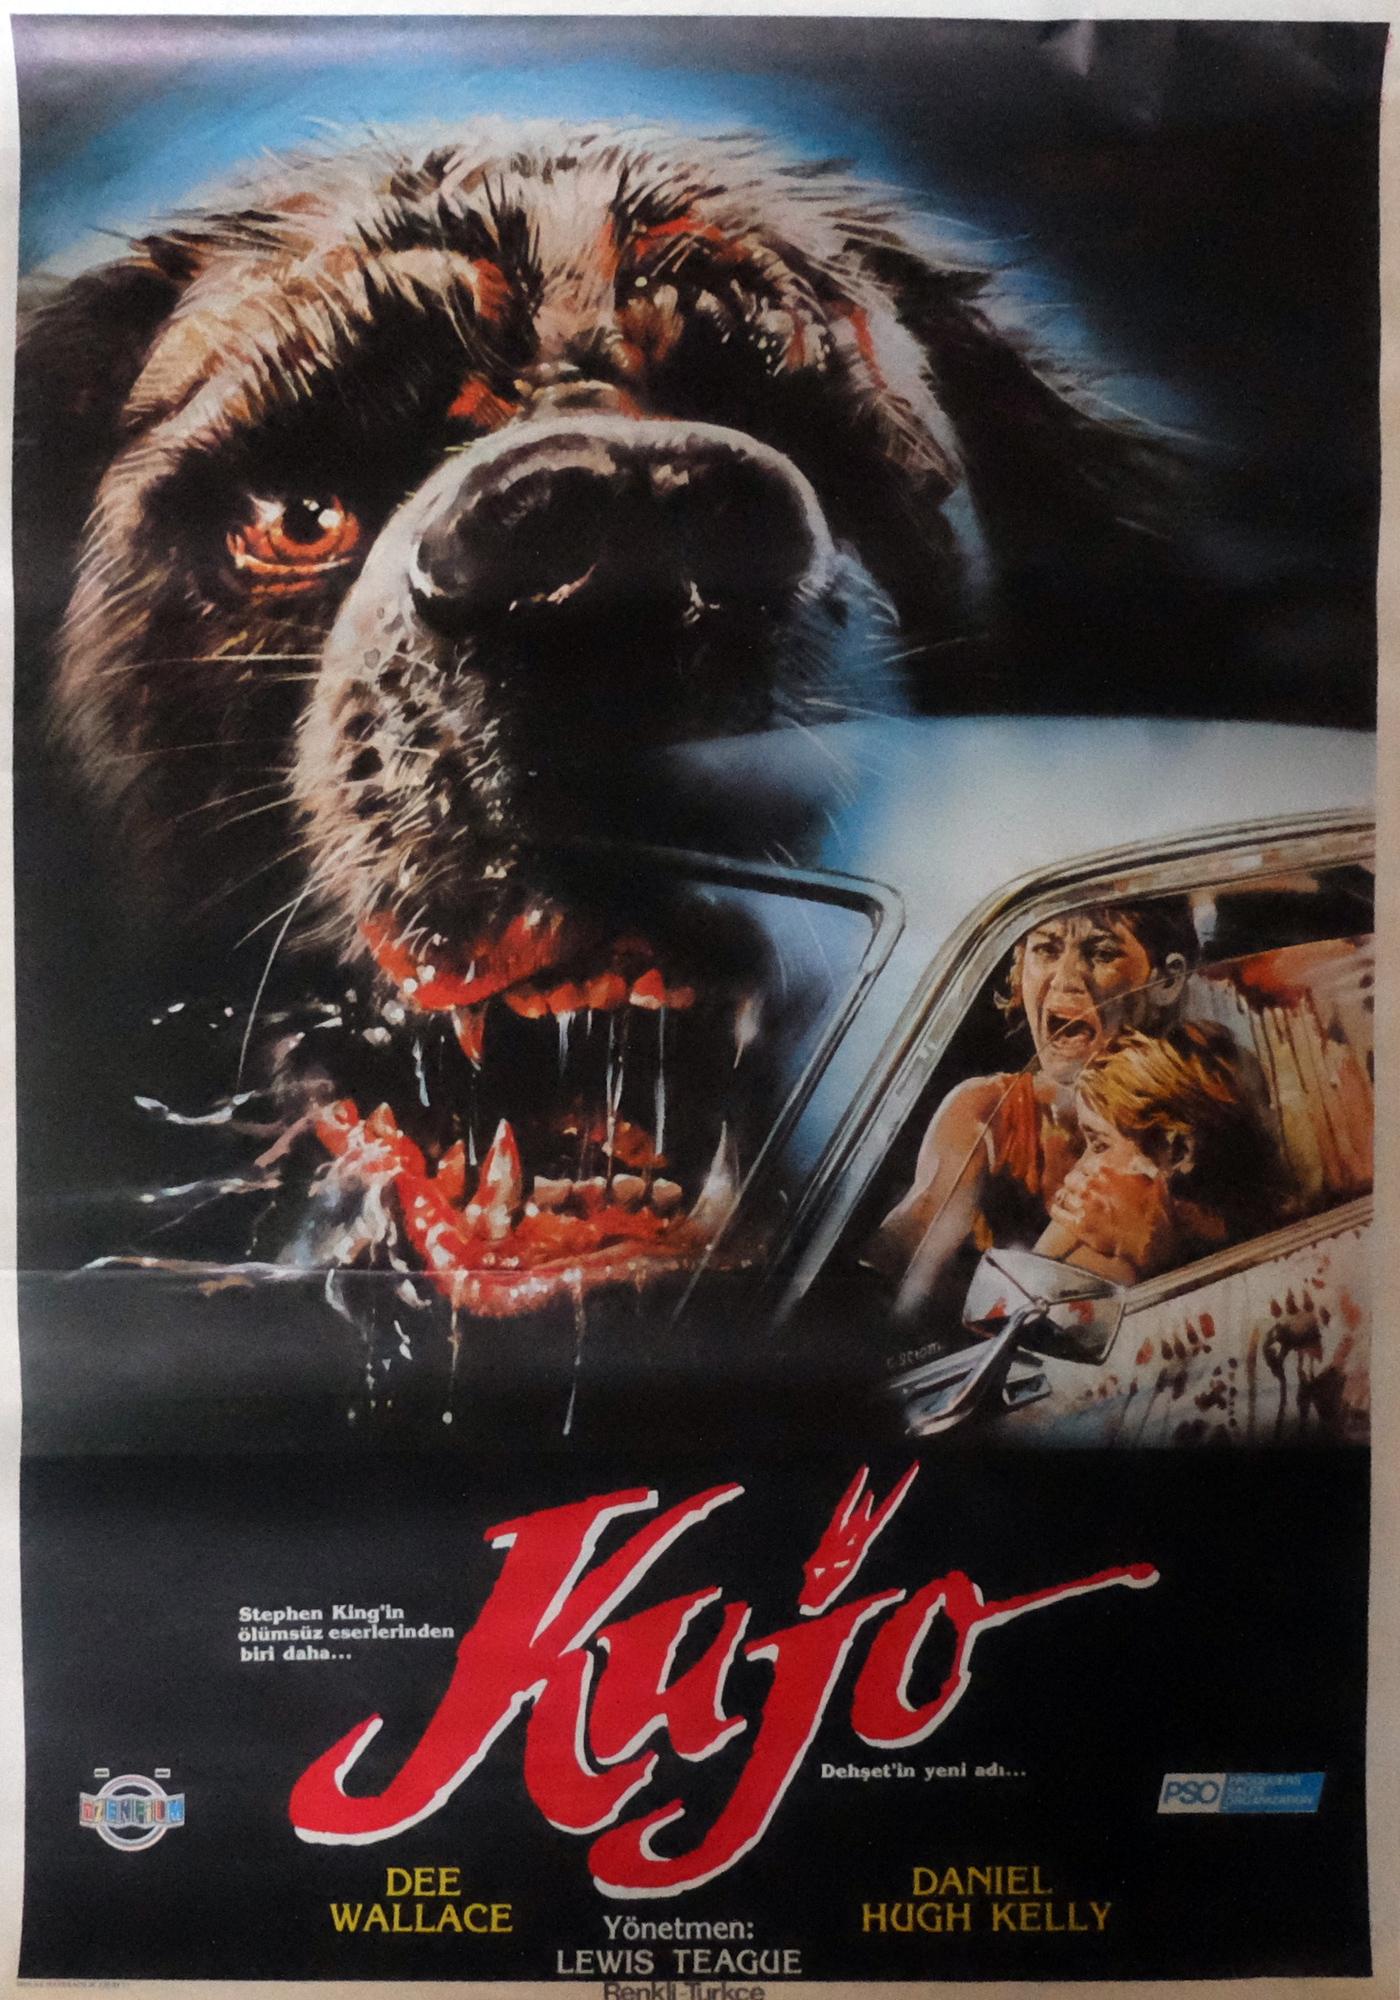 cujo-movie-poster-29x40-in-turkish-1983-lewis-teague-dee-wallace.jpg